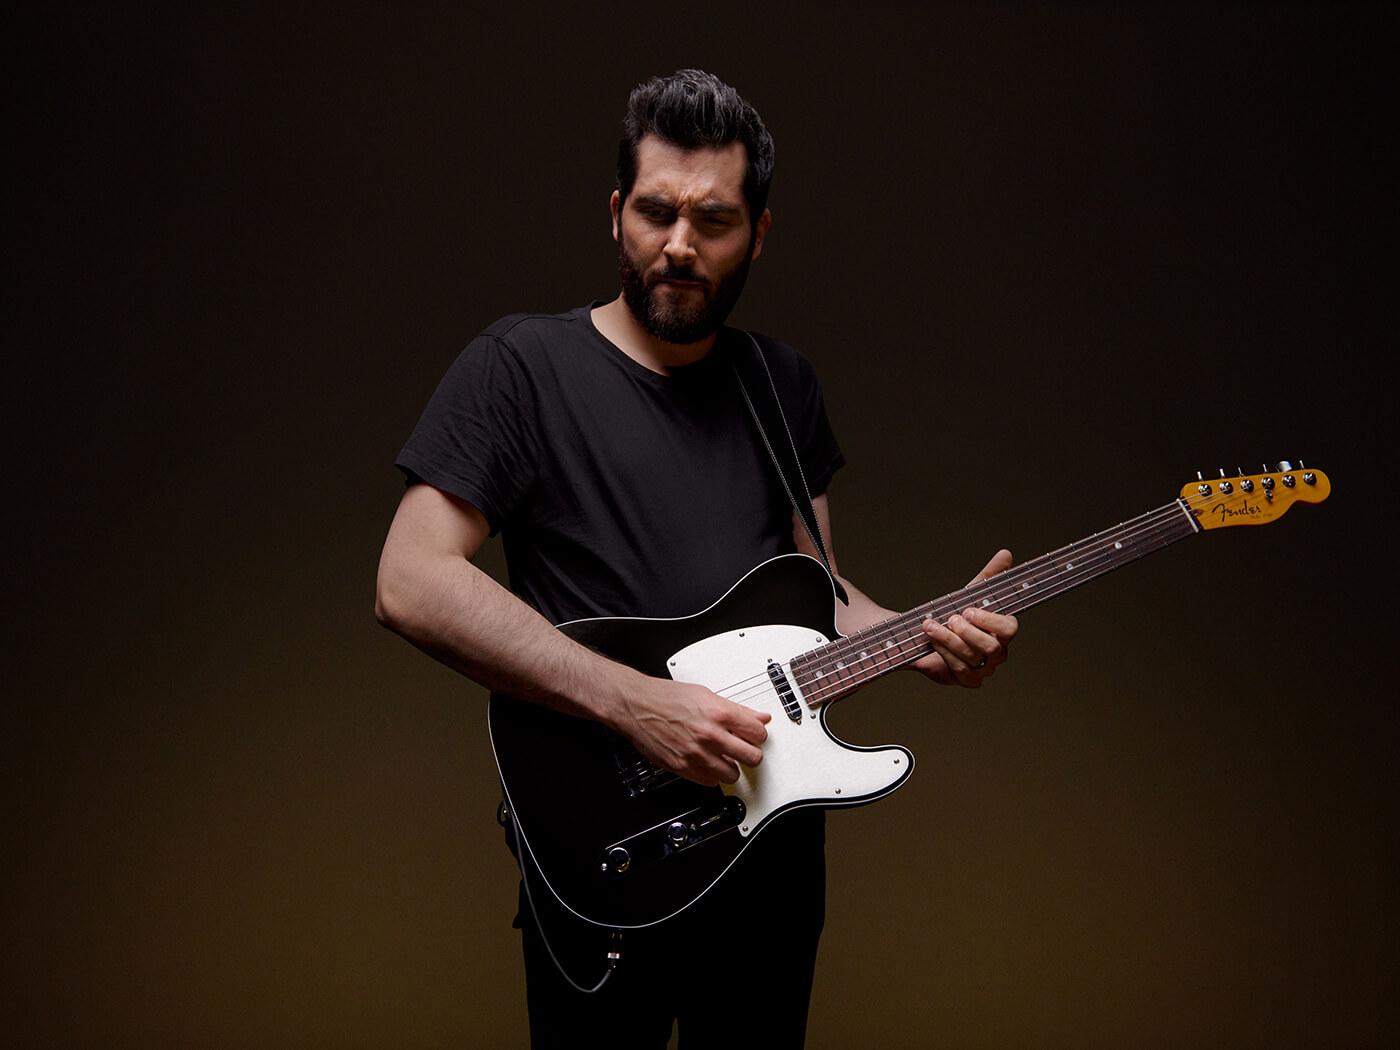 Fender Ultra Ariel Posen Telecaster